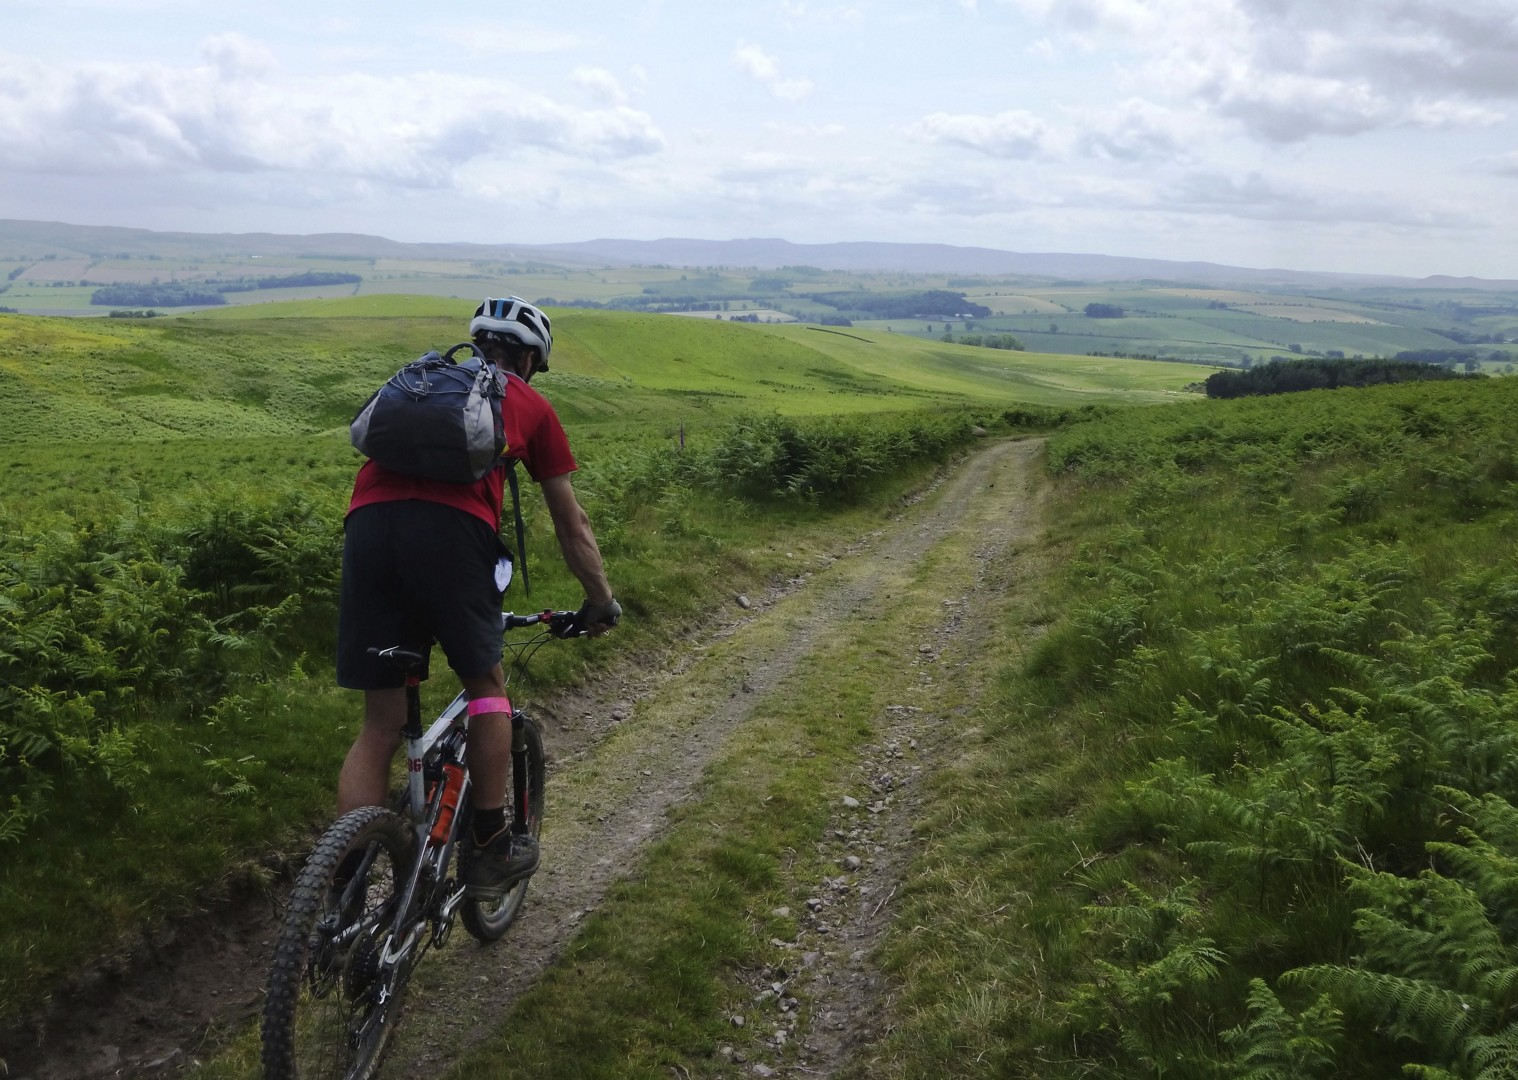 Standstoneway3.jpg - UK - Northumberland - Sandstone Way - Mountain Biking